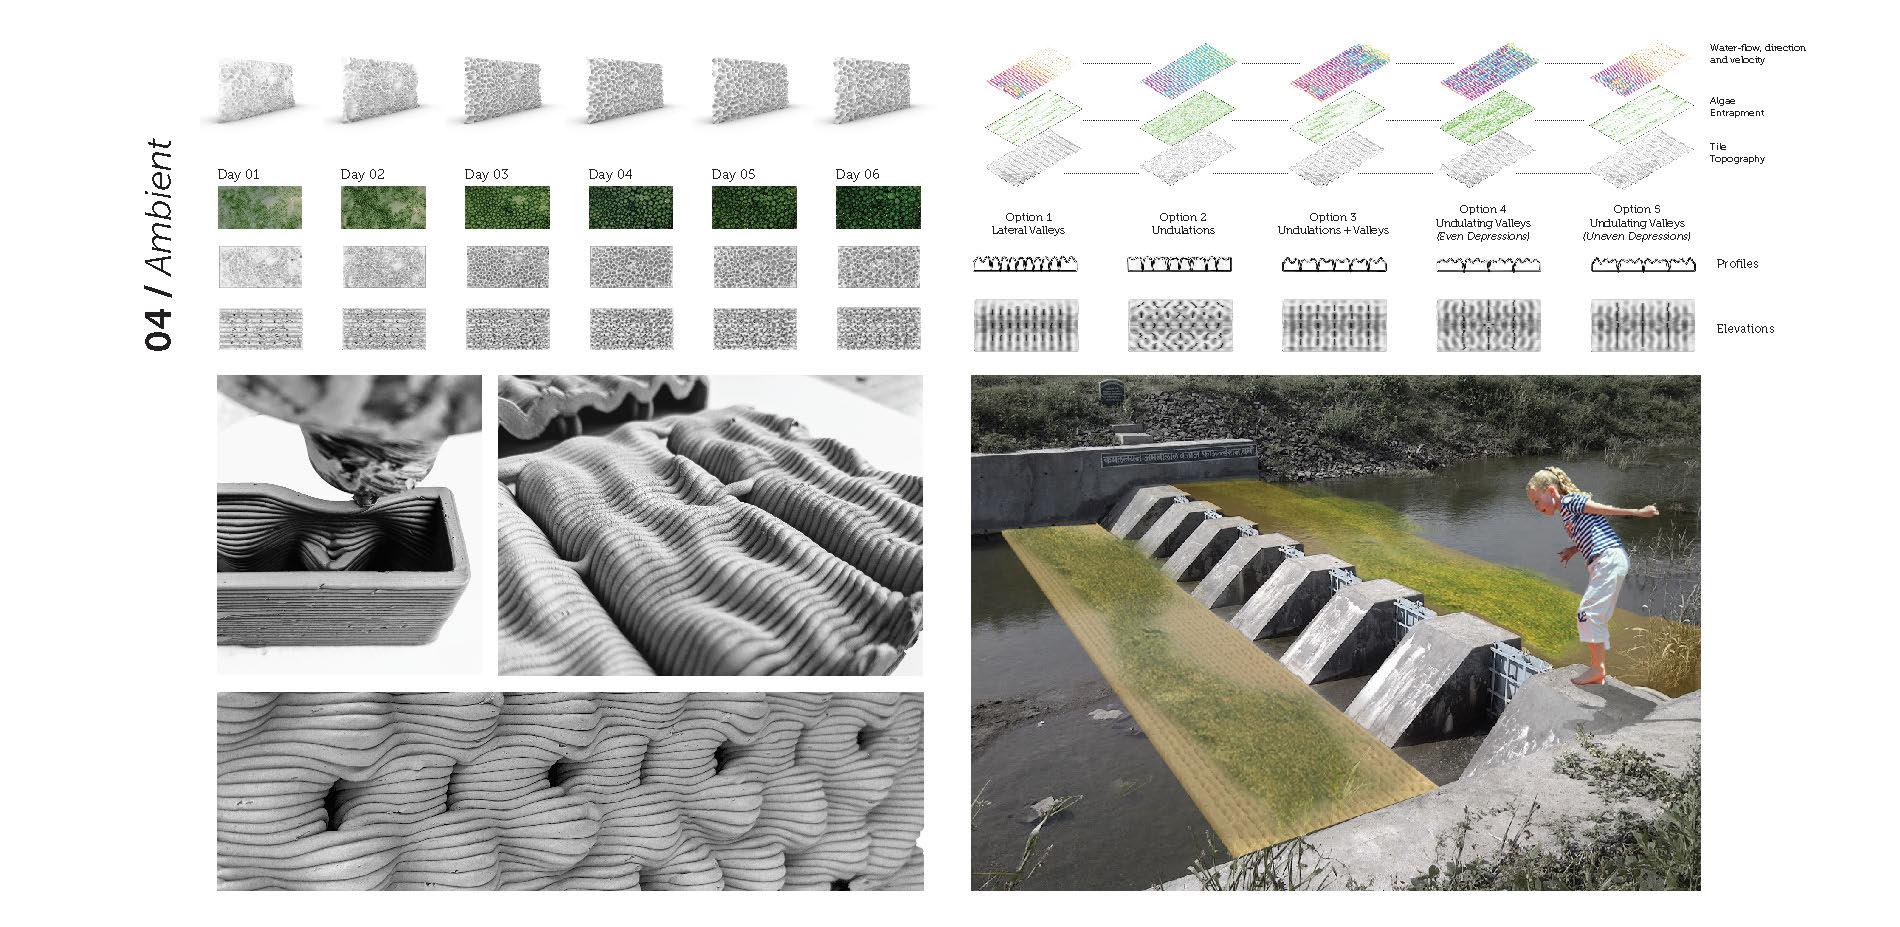 Algae Mitigation Tile Studies